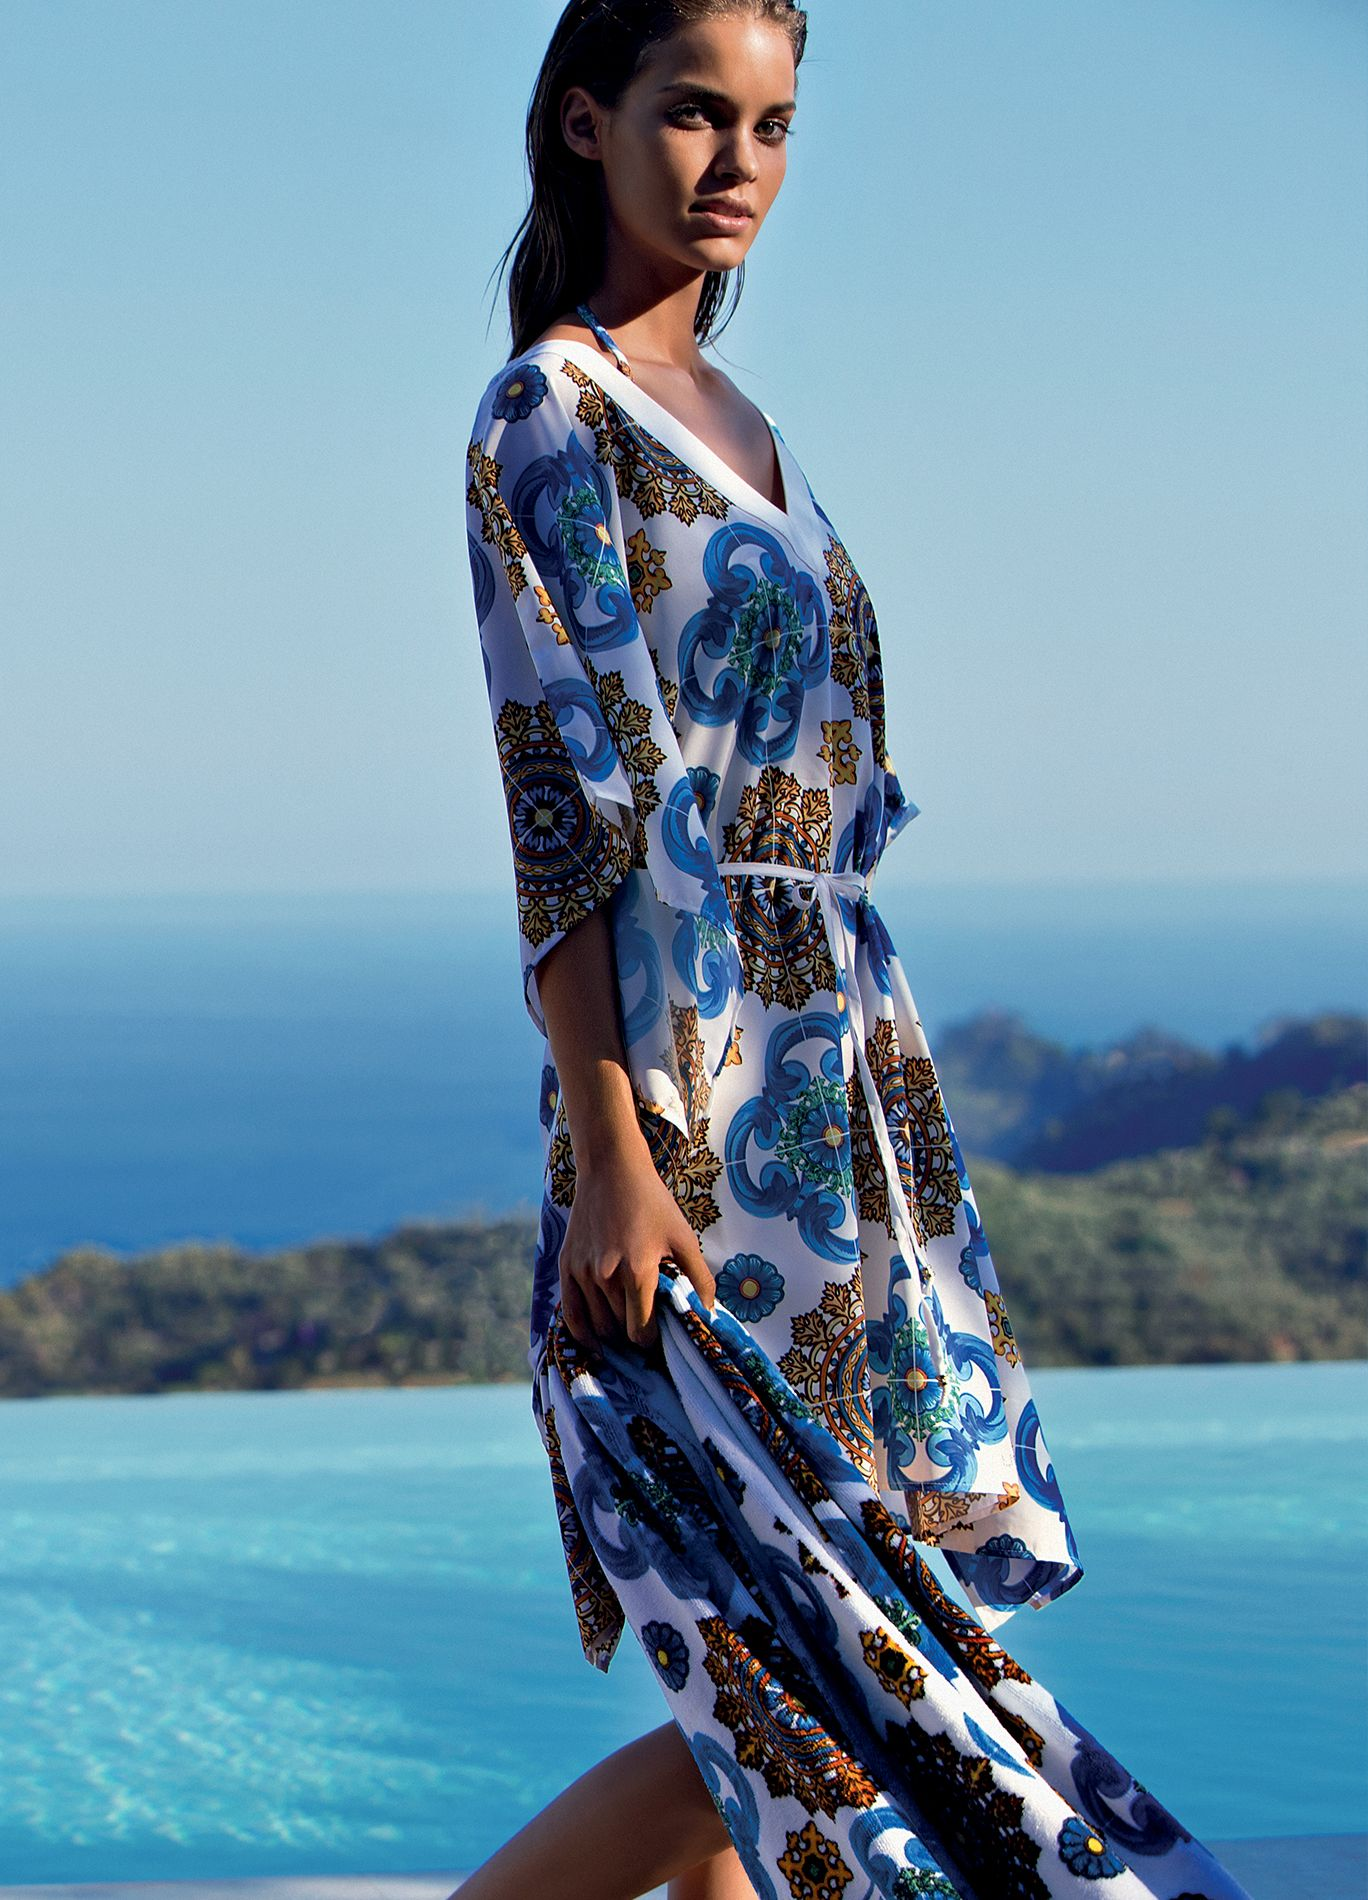 d531daf0ed Liu Jo | Beachwear Spring Summer 2017 #LiuJo #Beachwear #Swimwear #Fashion  #Style #Summer